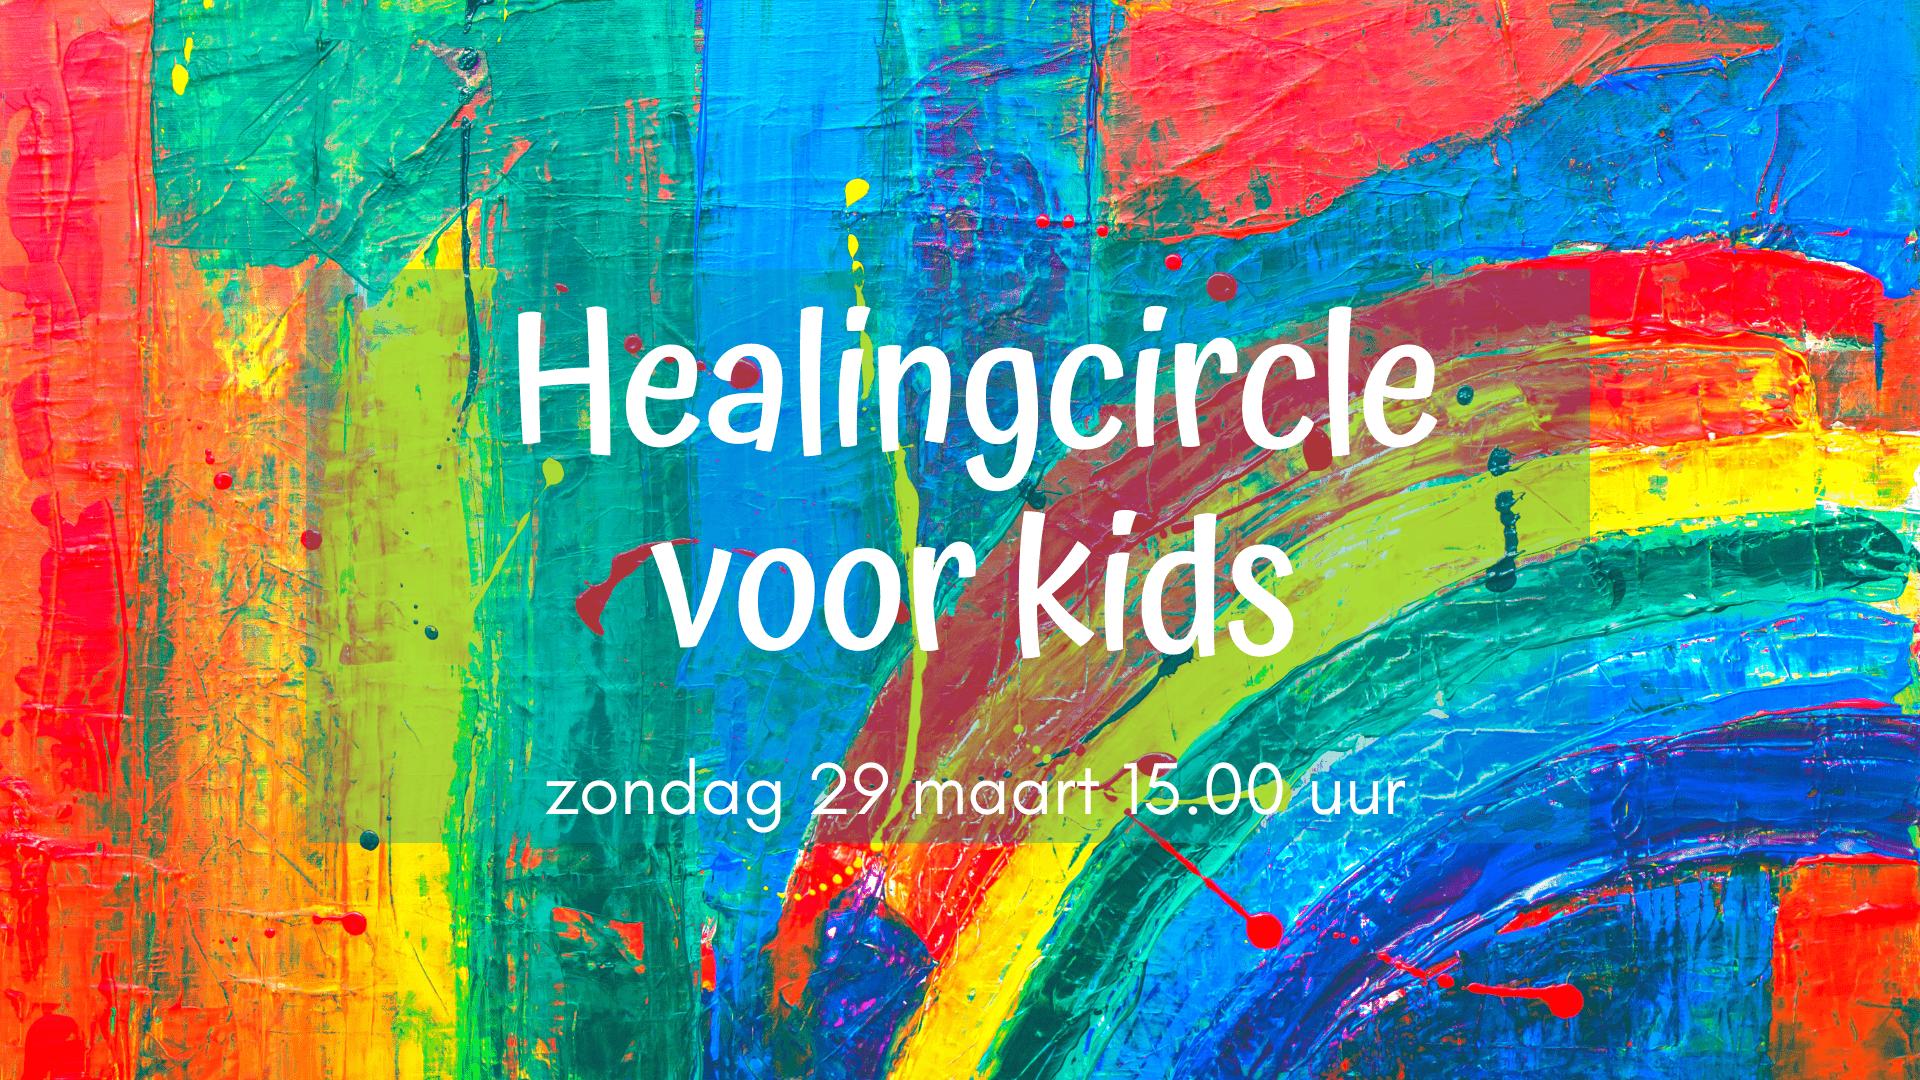 Healingcircle kids 2